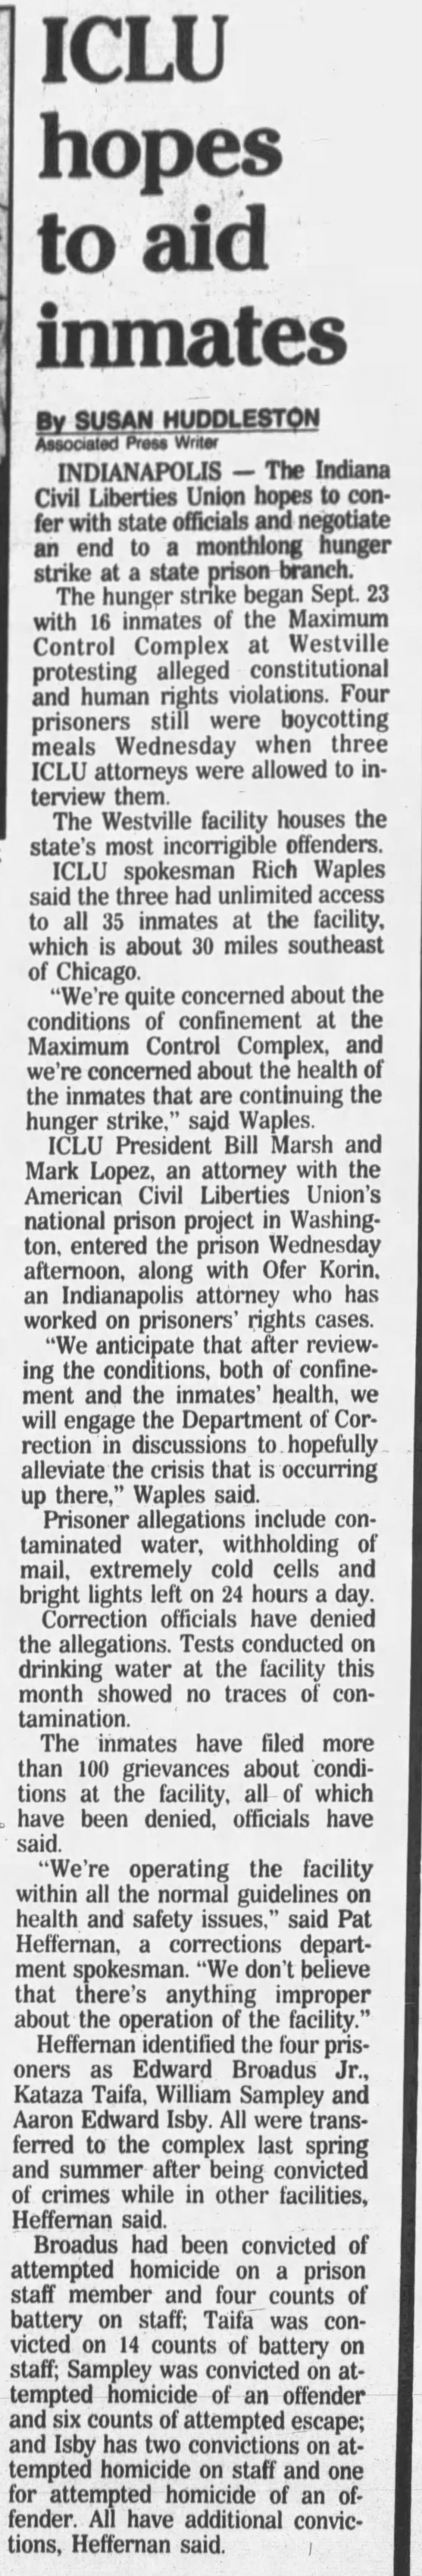 The_South_Bend_Tribune_Thu__Oct_24__1991_.jpg